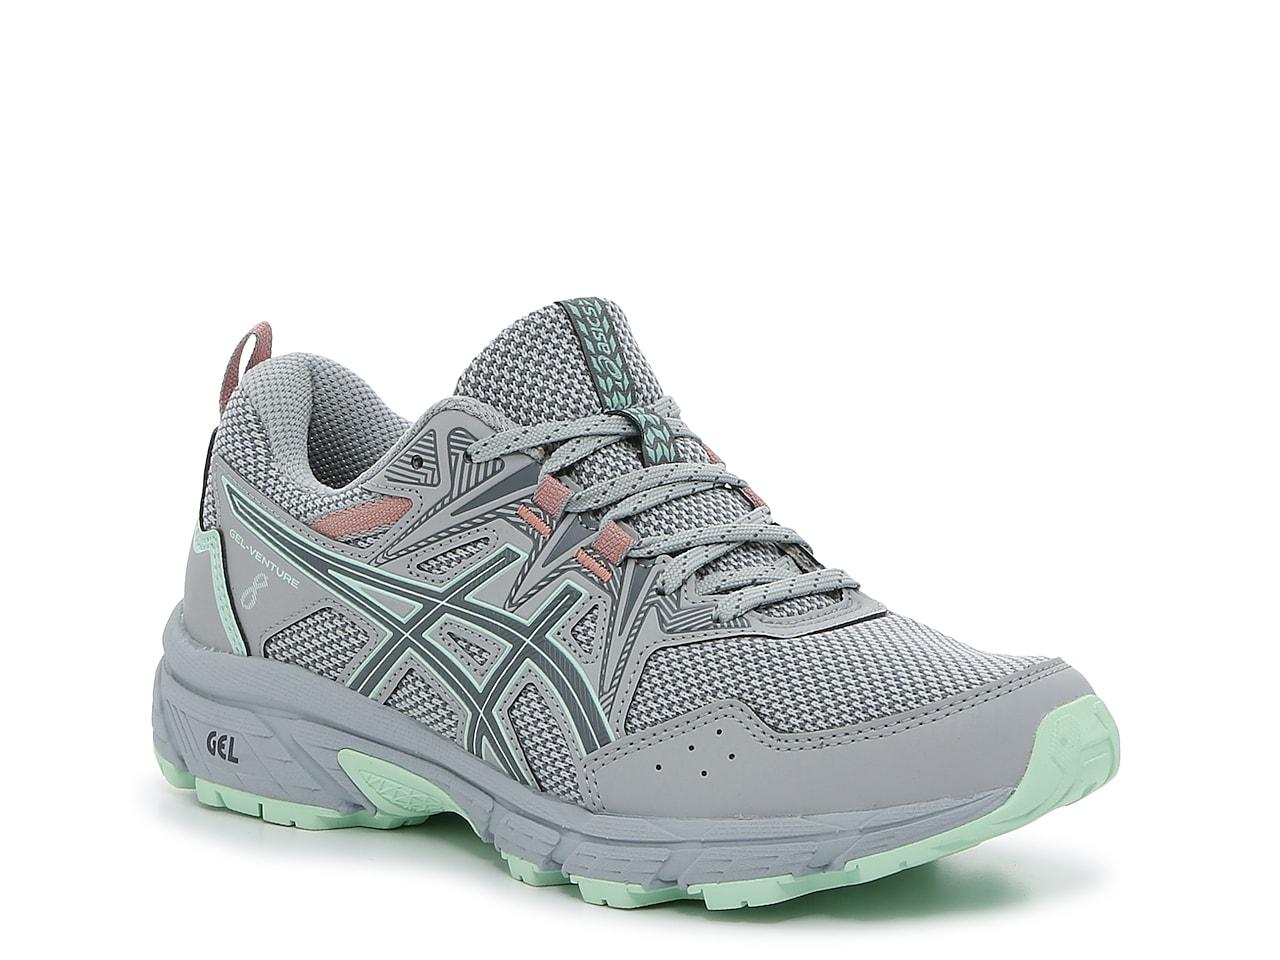 ASICS GEL-Venture 8 Running Shoe - Women's